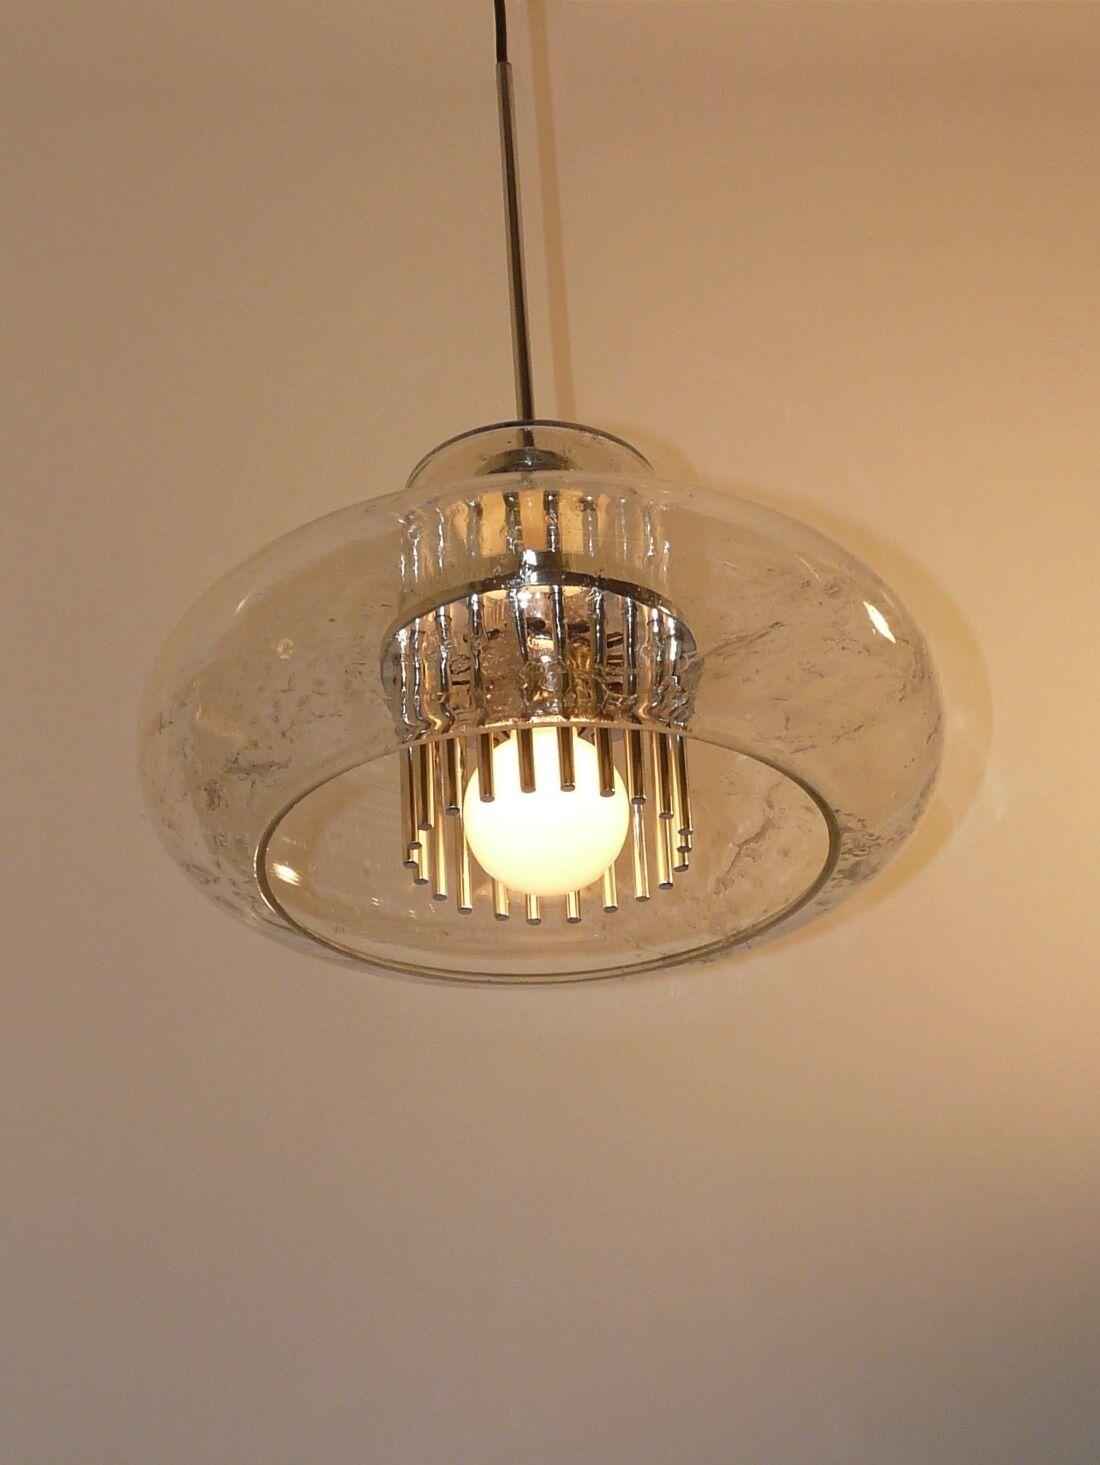 jahrgang, Stylish Pendant lampe, texturot Glass and Chrome, DORIA-Germanny